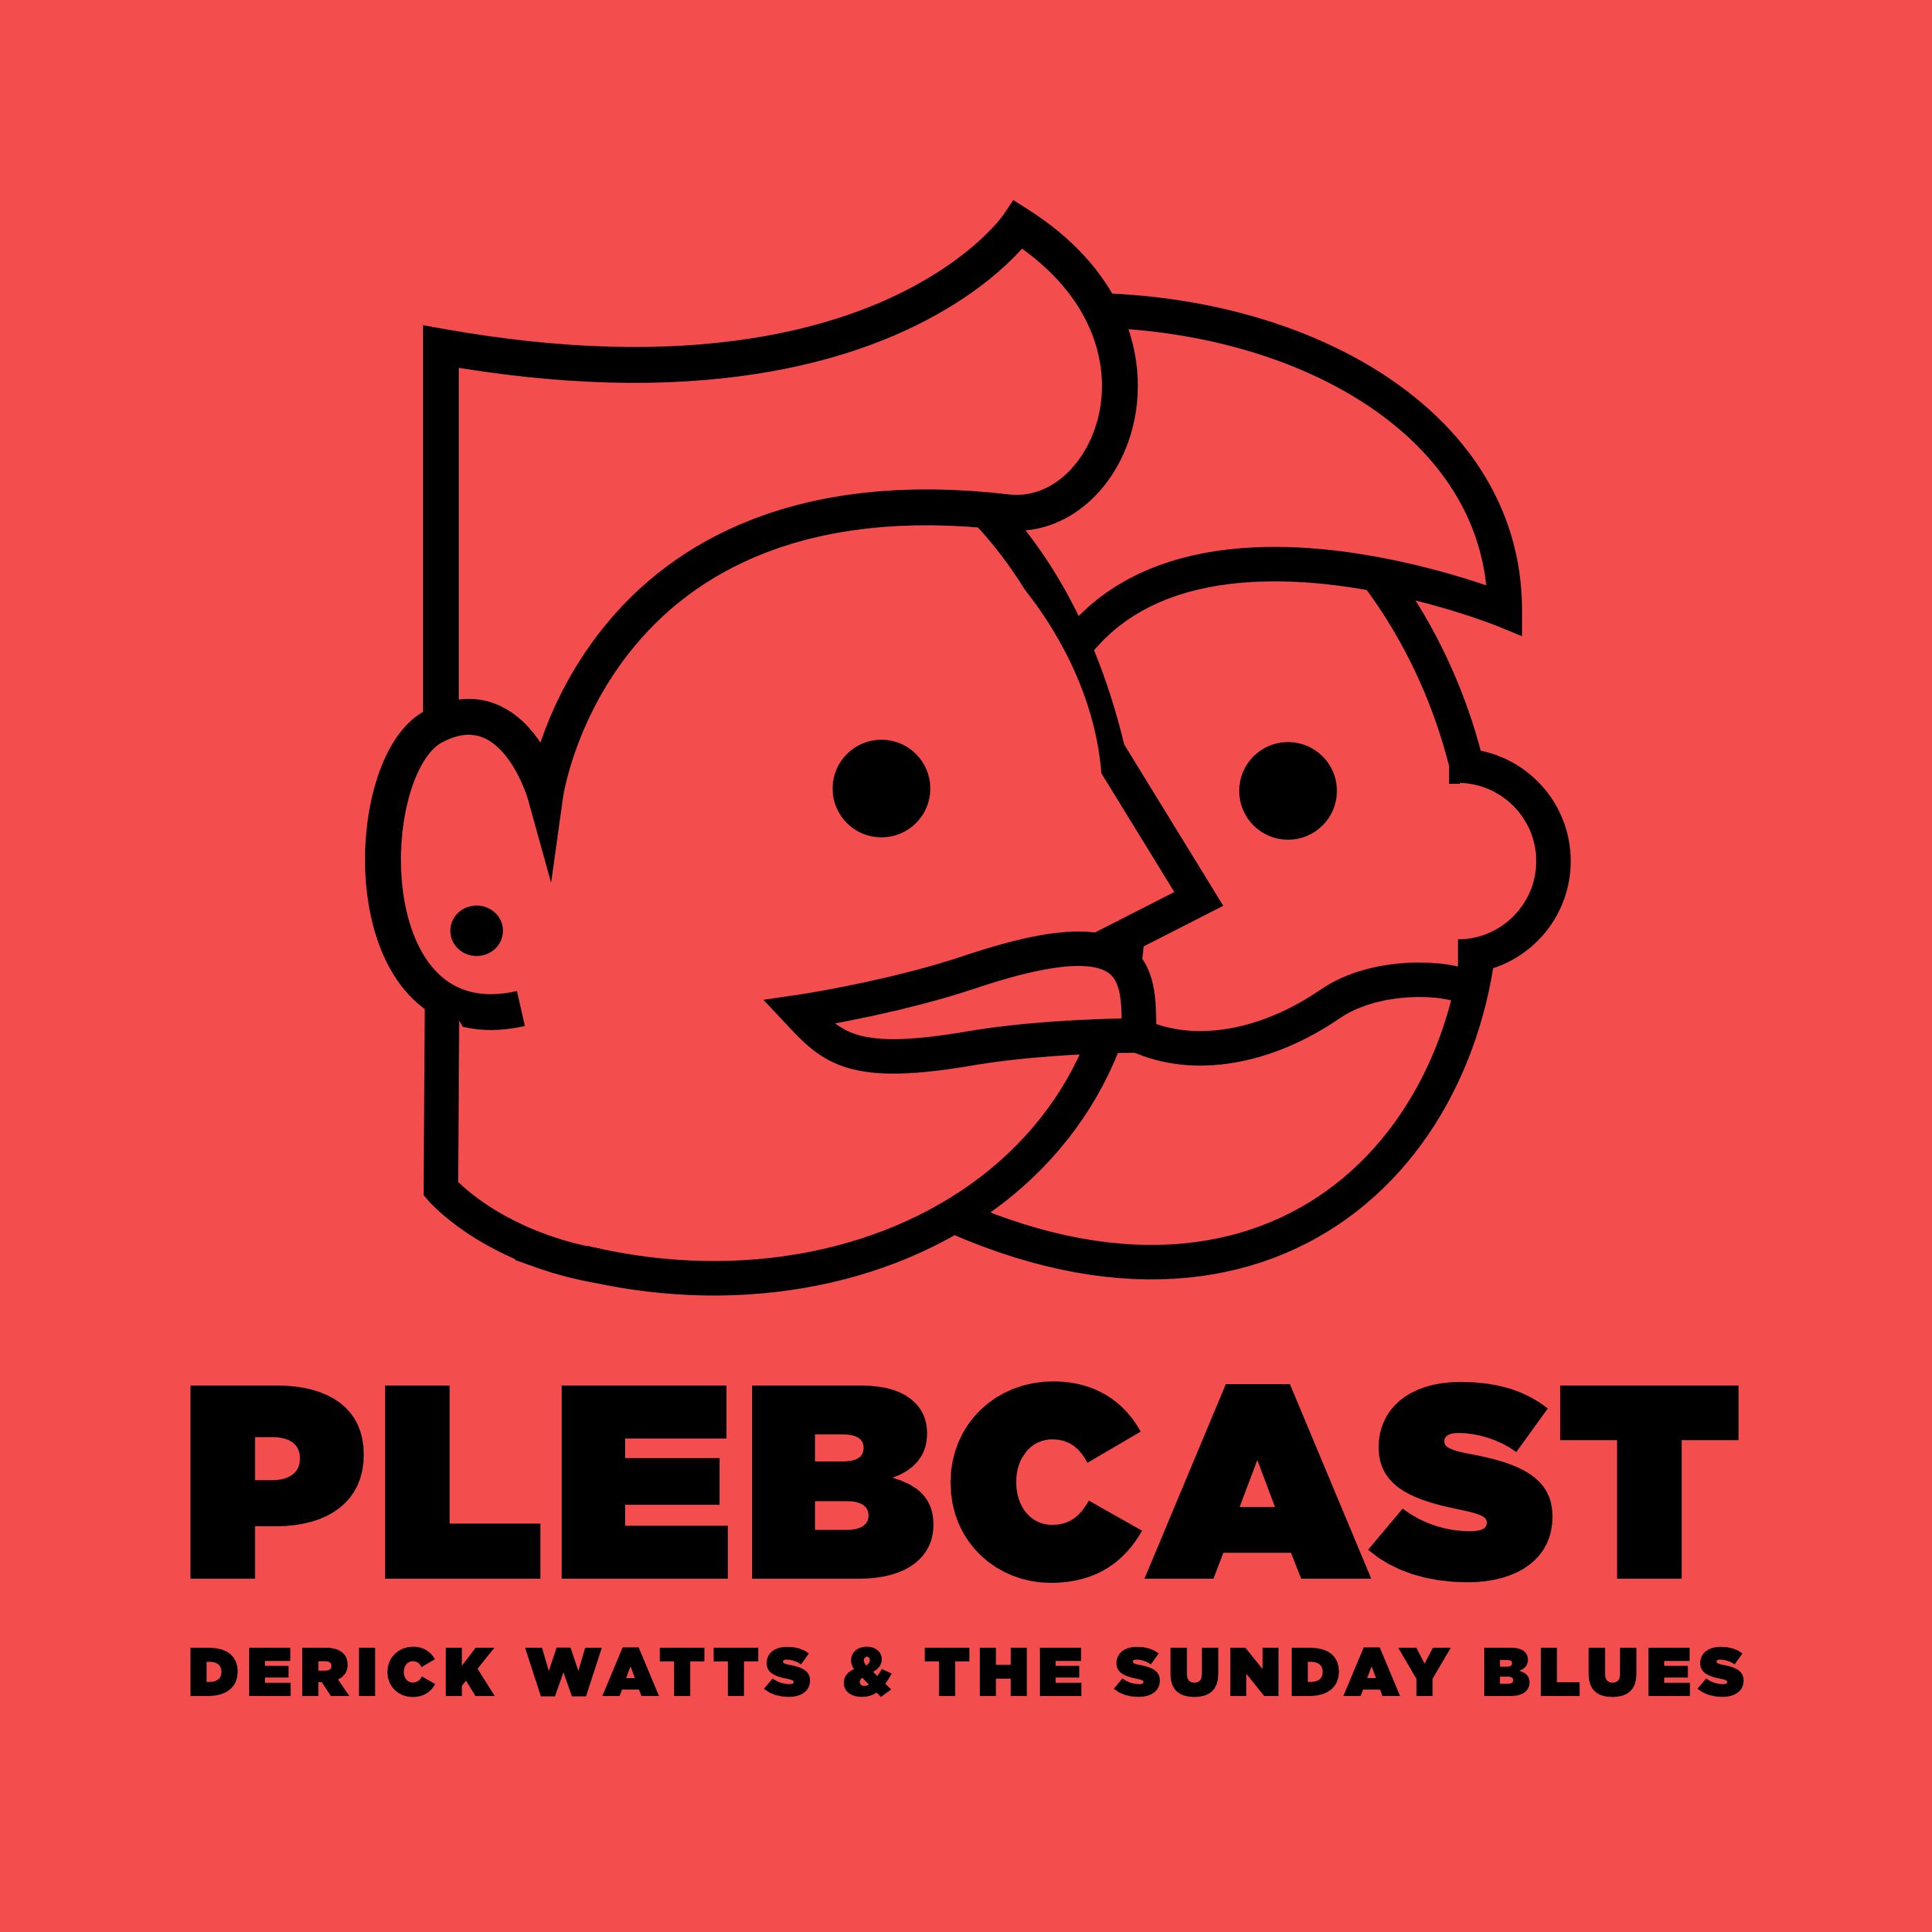 PLEBCAST: Derick Watts & The Sunday Blues